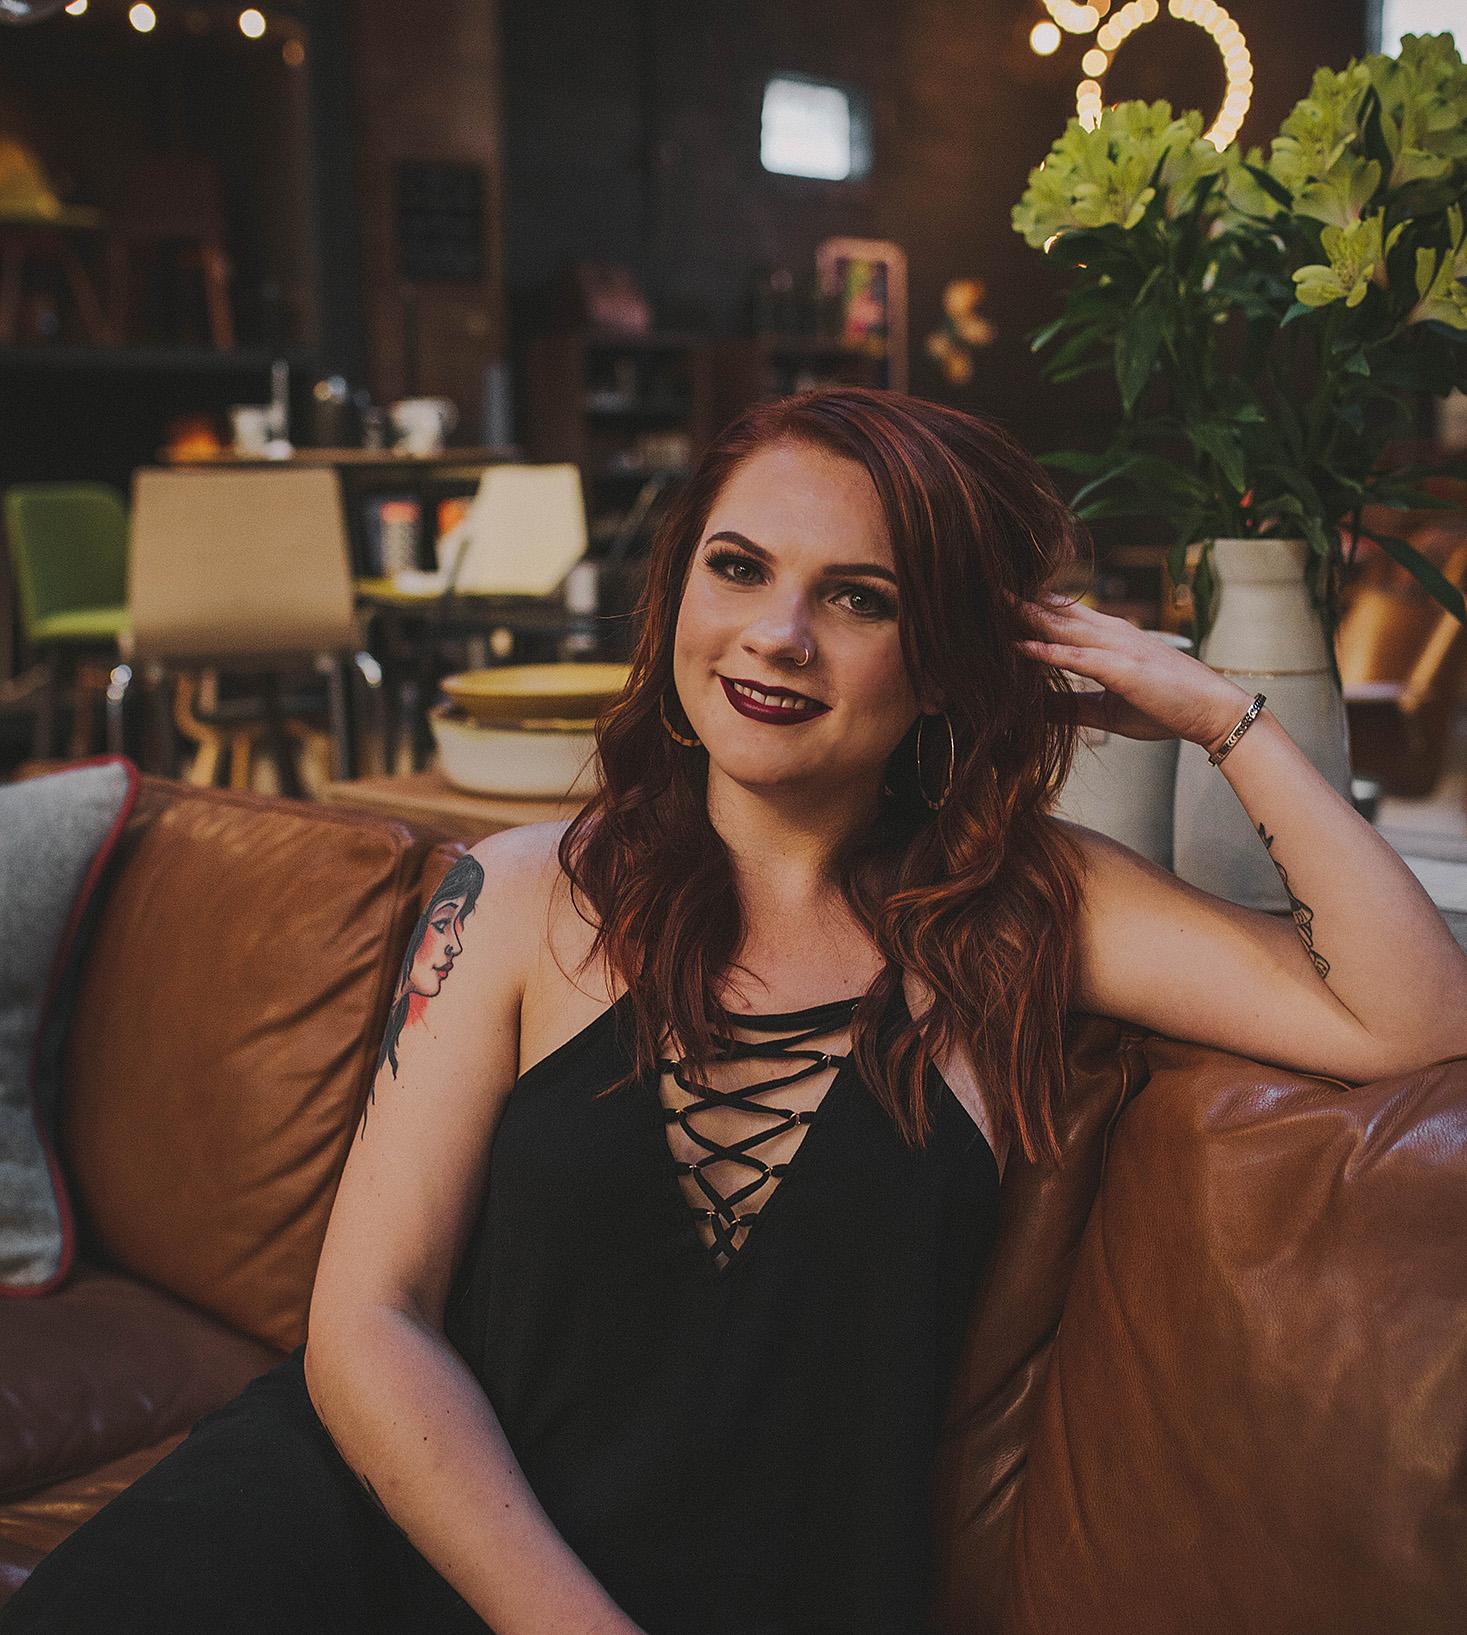 Rose Kalasz Co-Owner of Sex Boutique